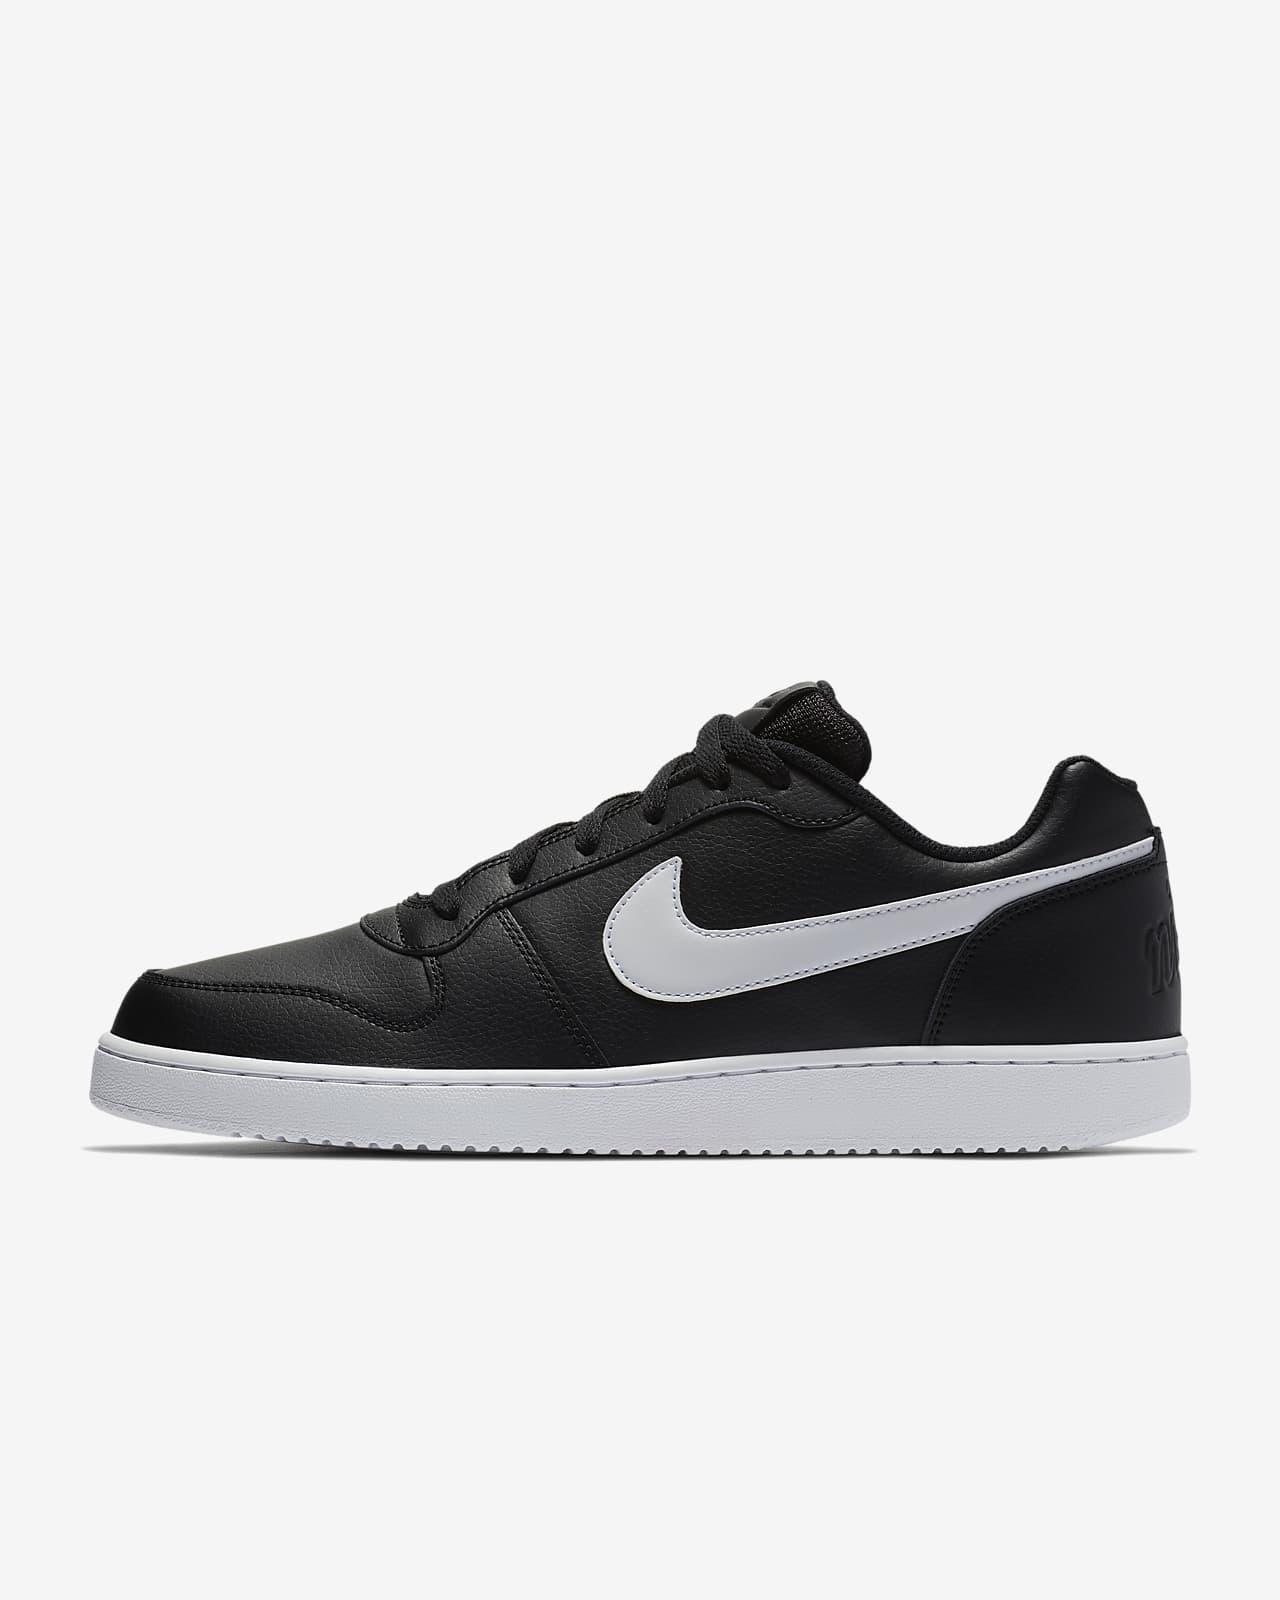 Nike Ebernon Low Herrenschuh